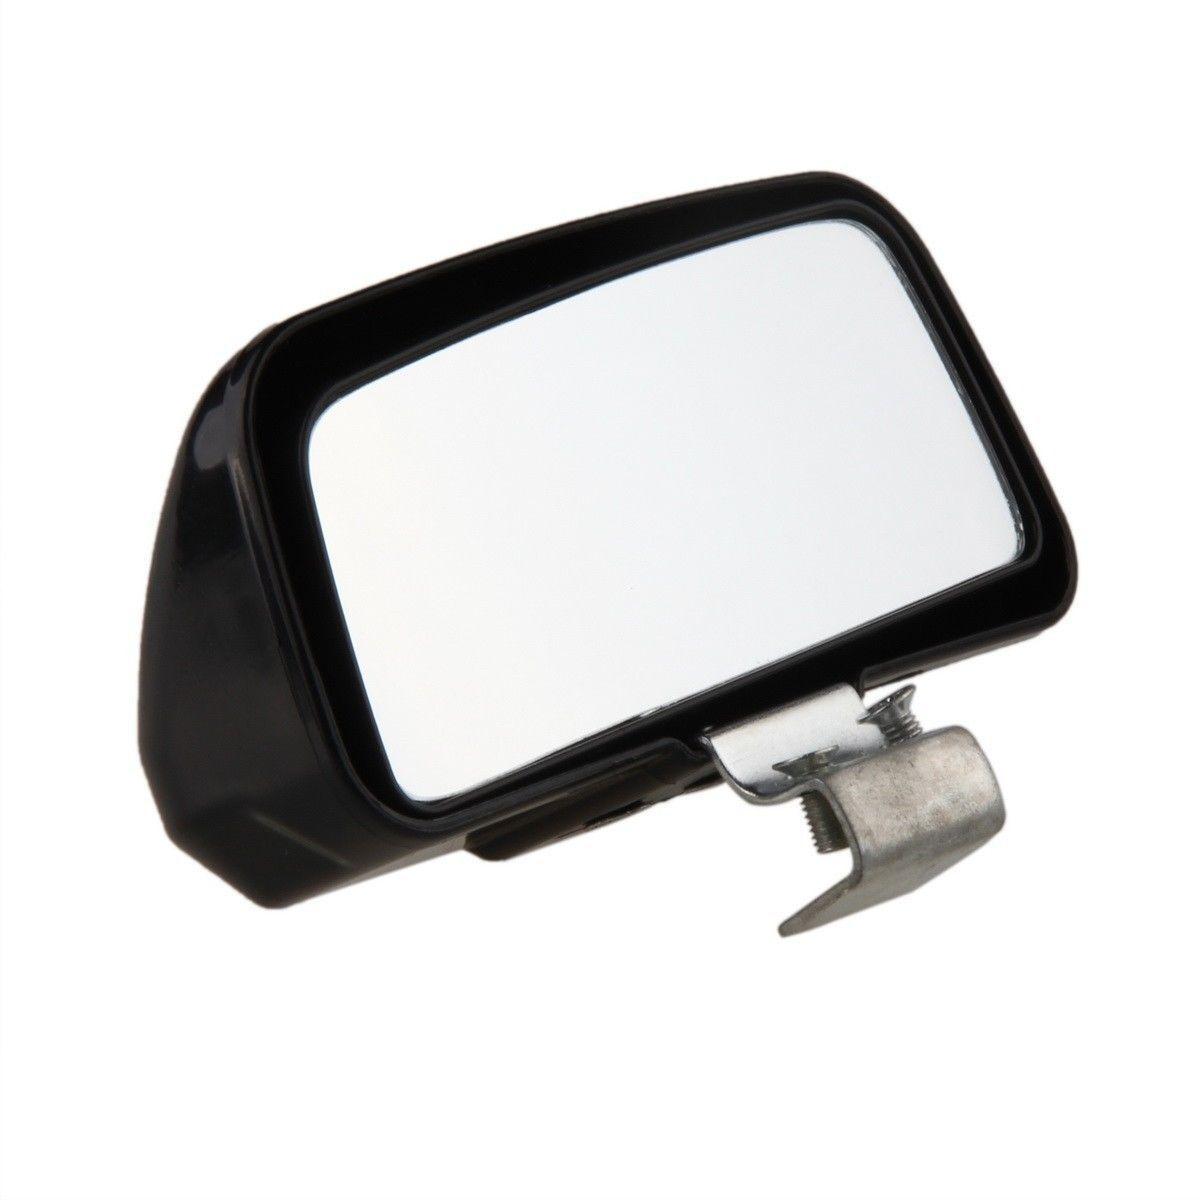 Regal Intrigue Power Black Fold Rear View Door Mirror Left /& Right Side Set PAIR